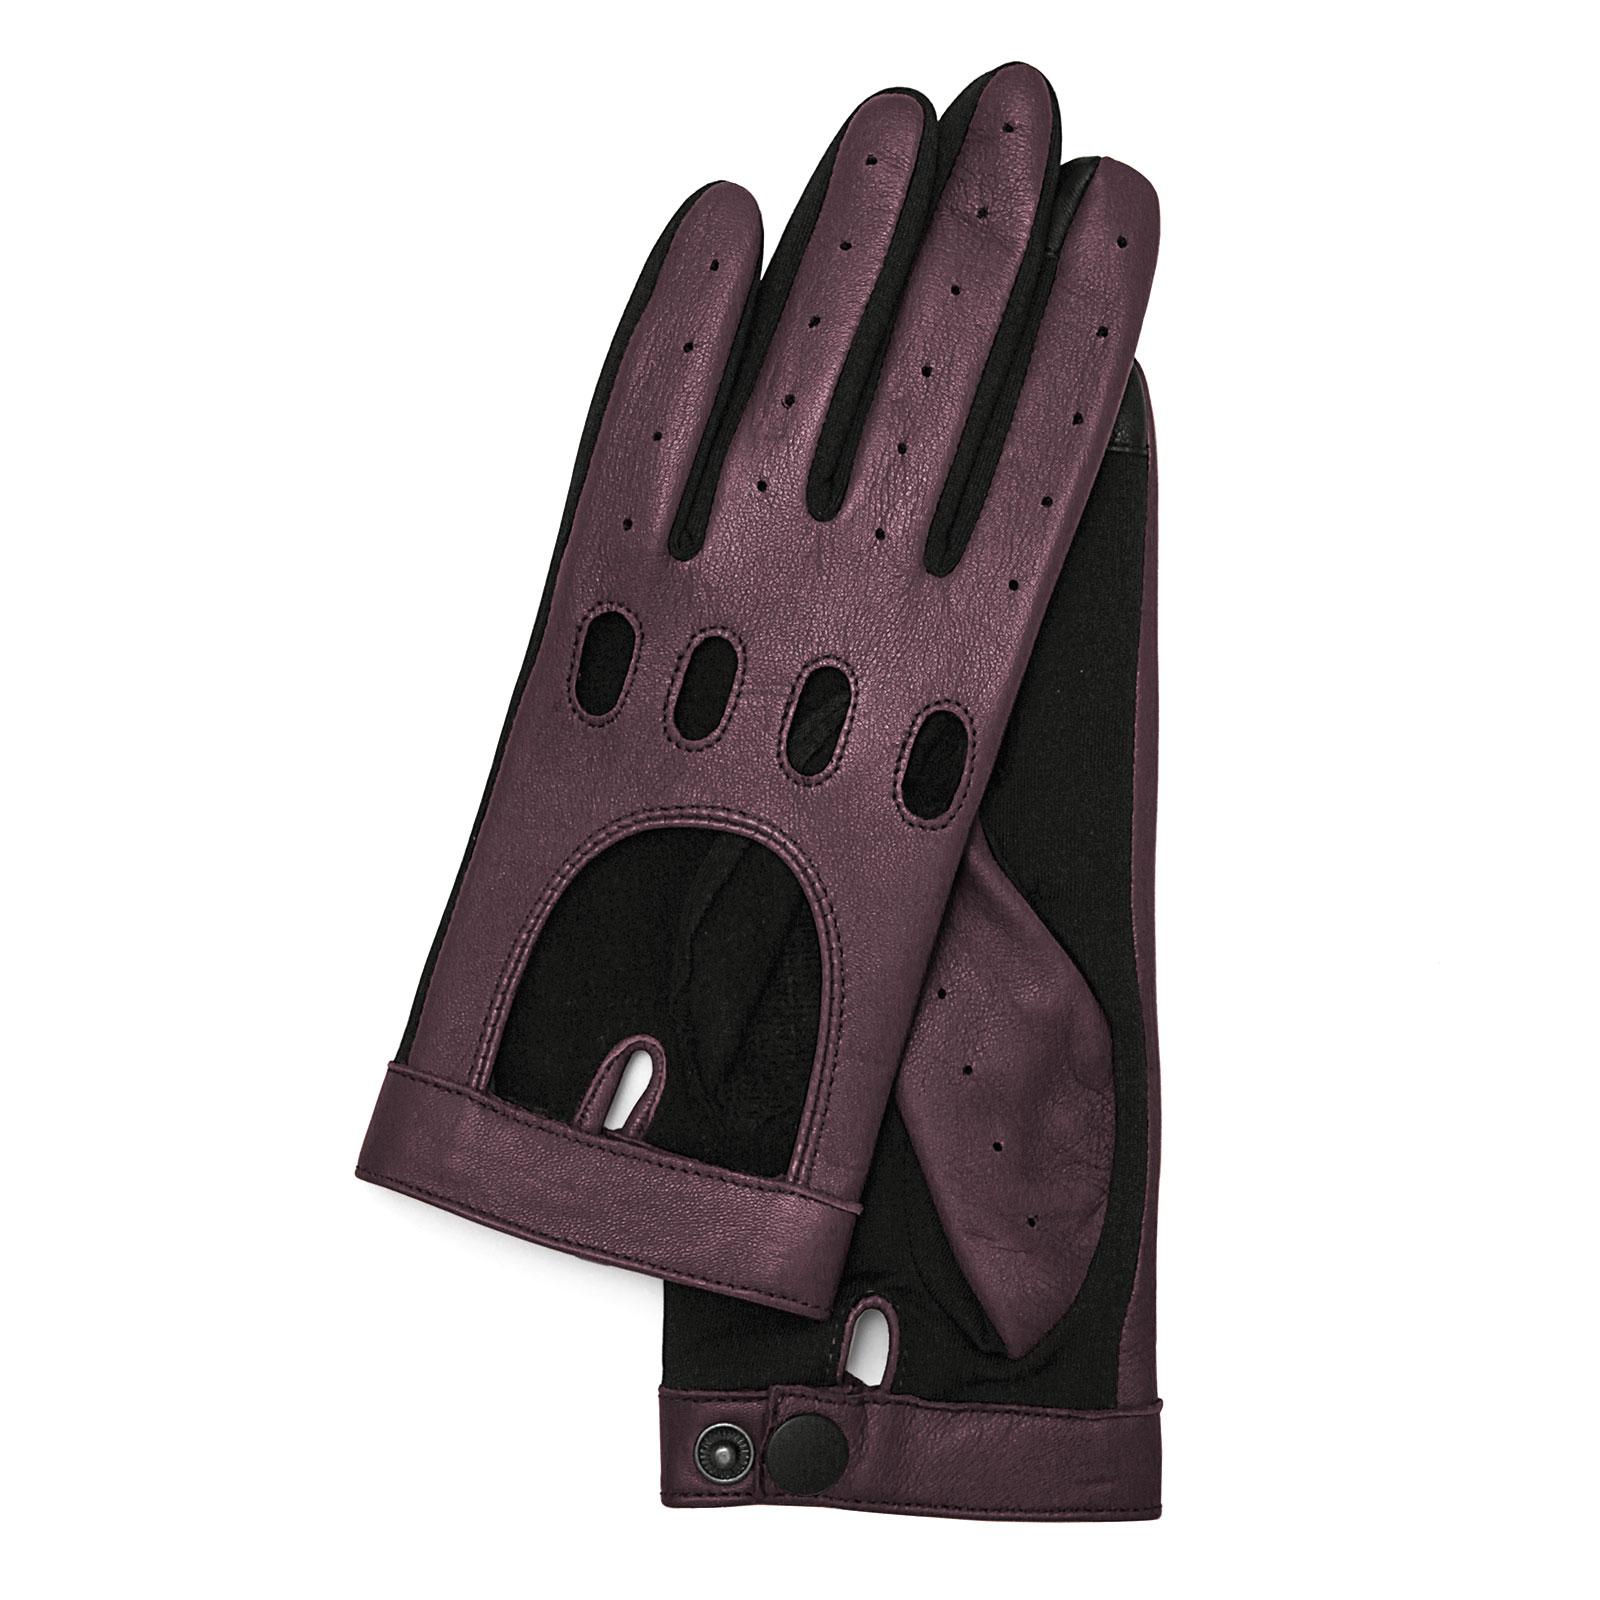 Mia Driver's Glove deep purple 179